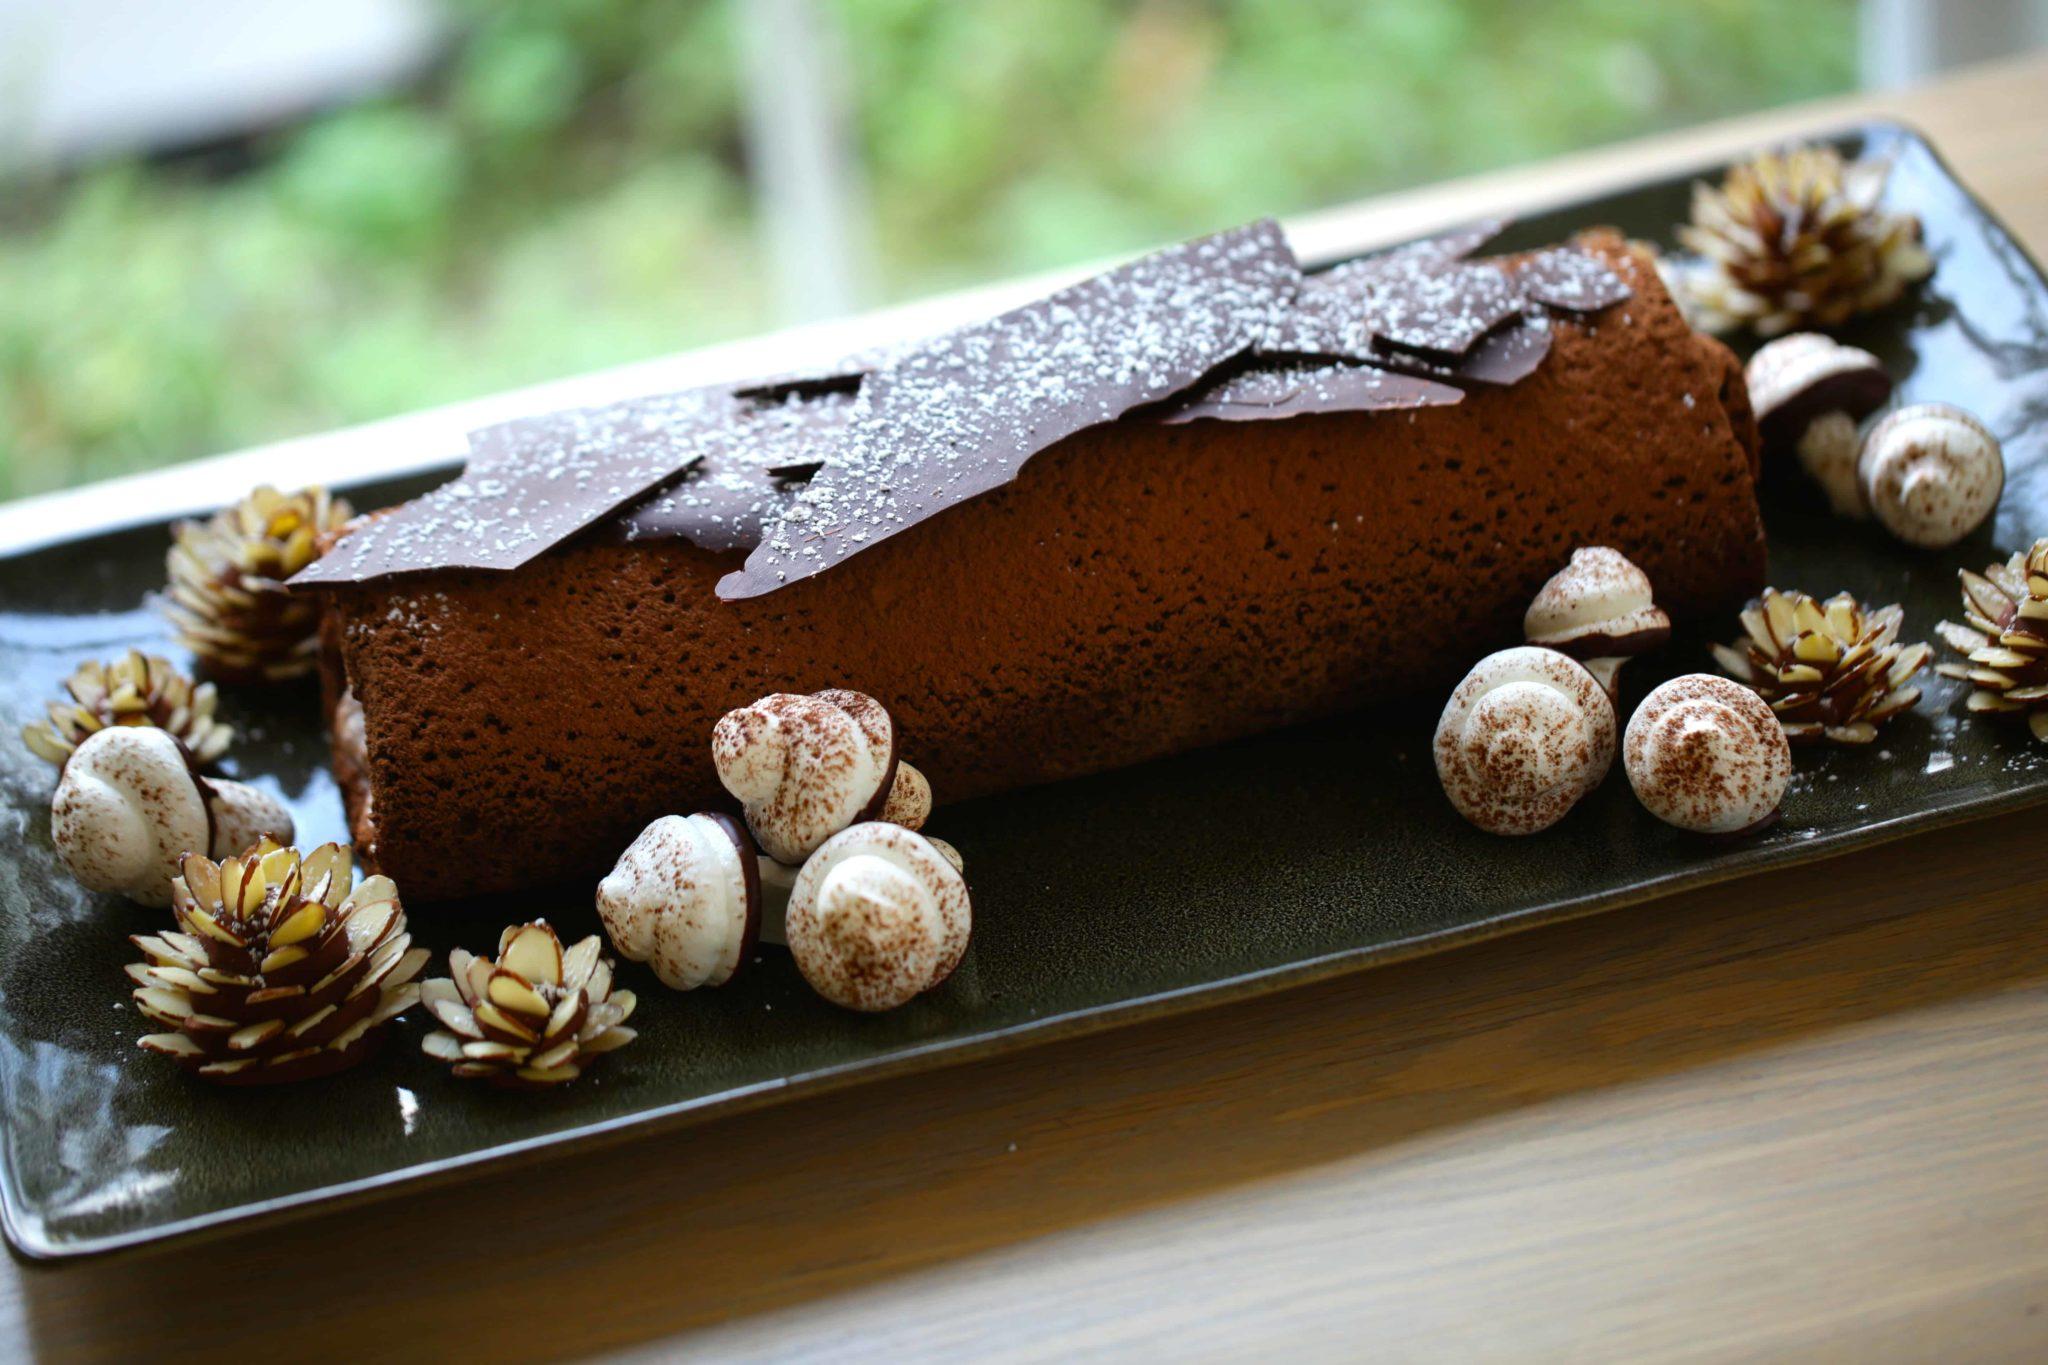 buche de noel recipe how to make a yule log. Black Bedroom Furniture Sets. Home Design Ideas